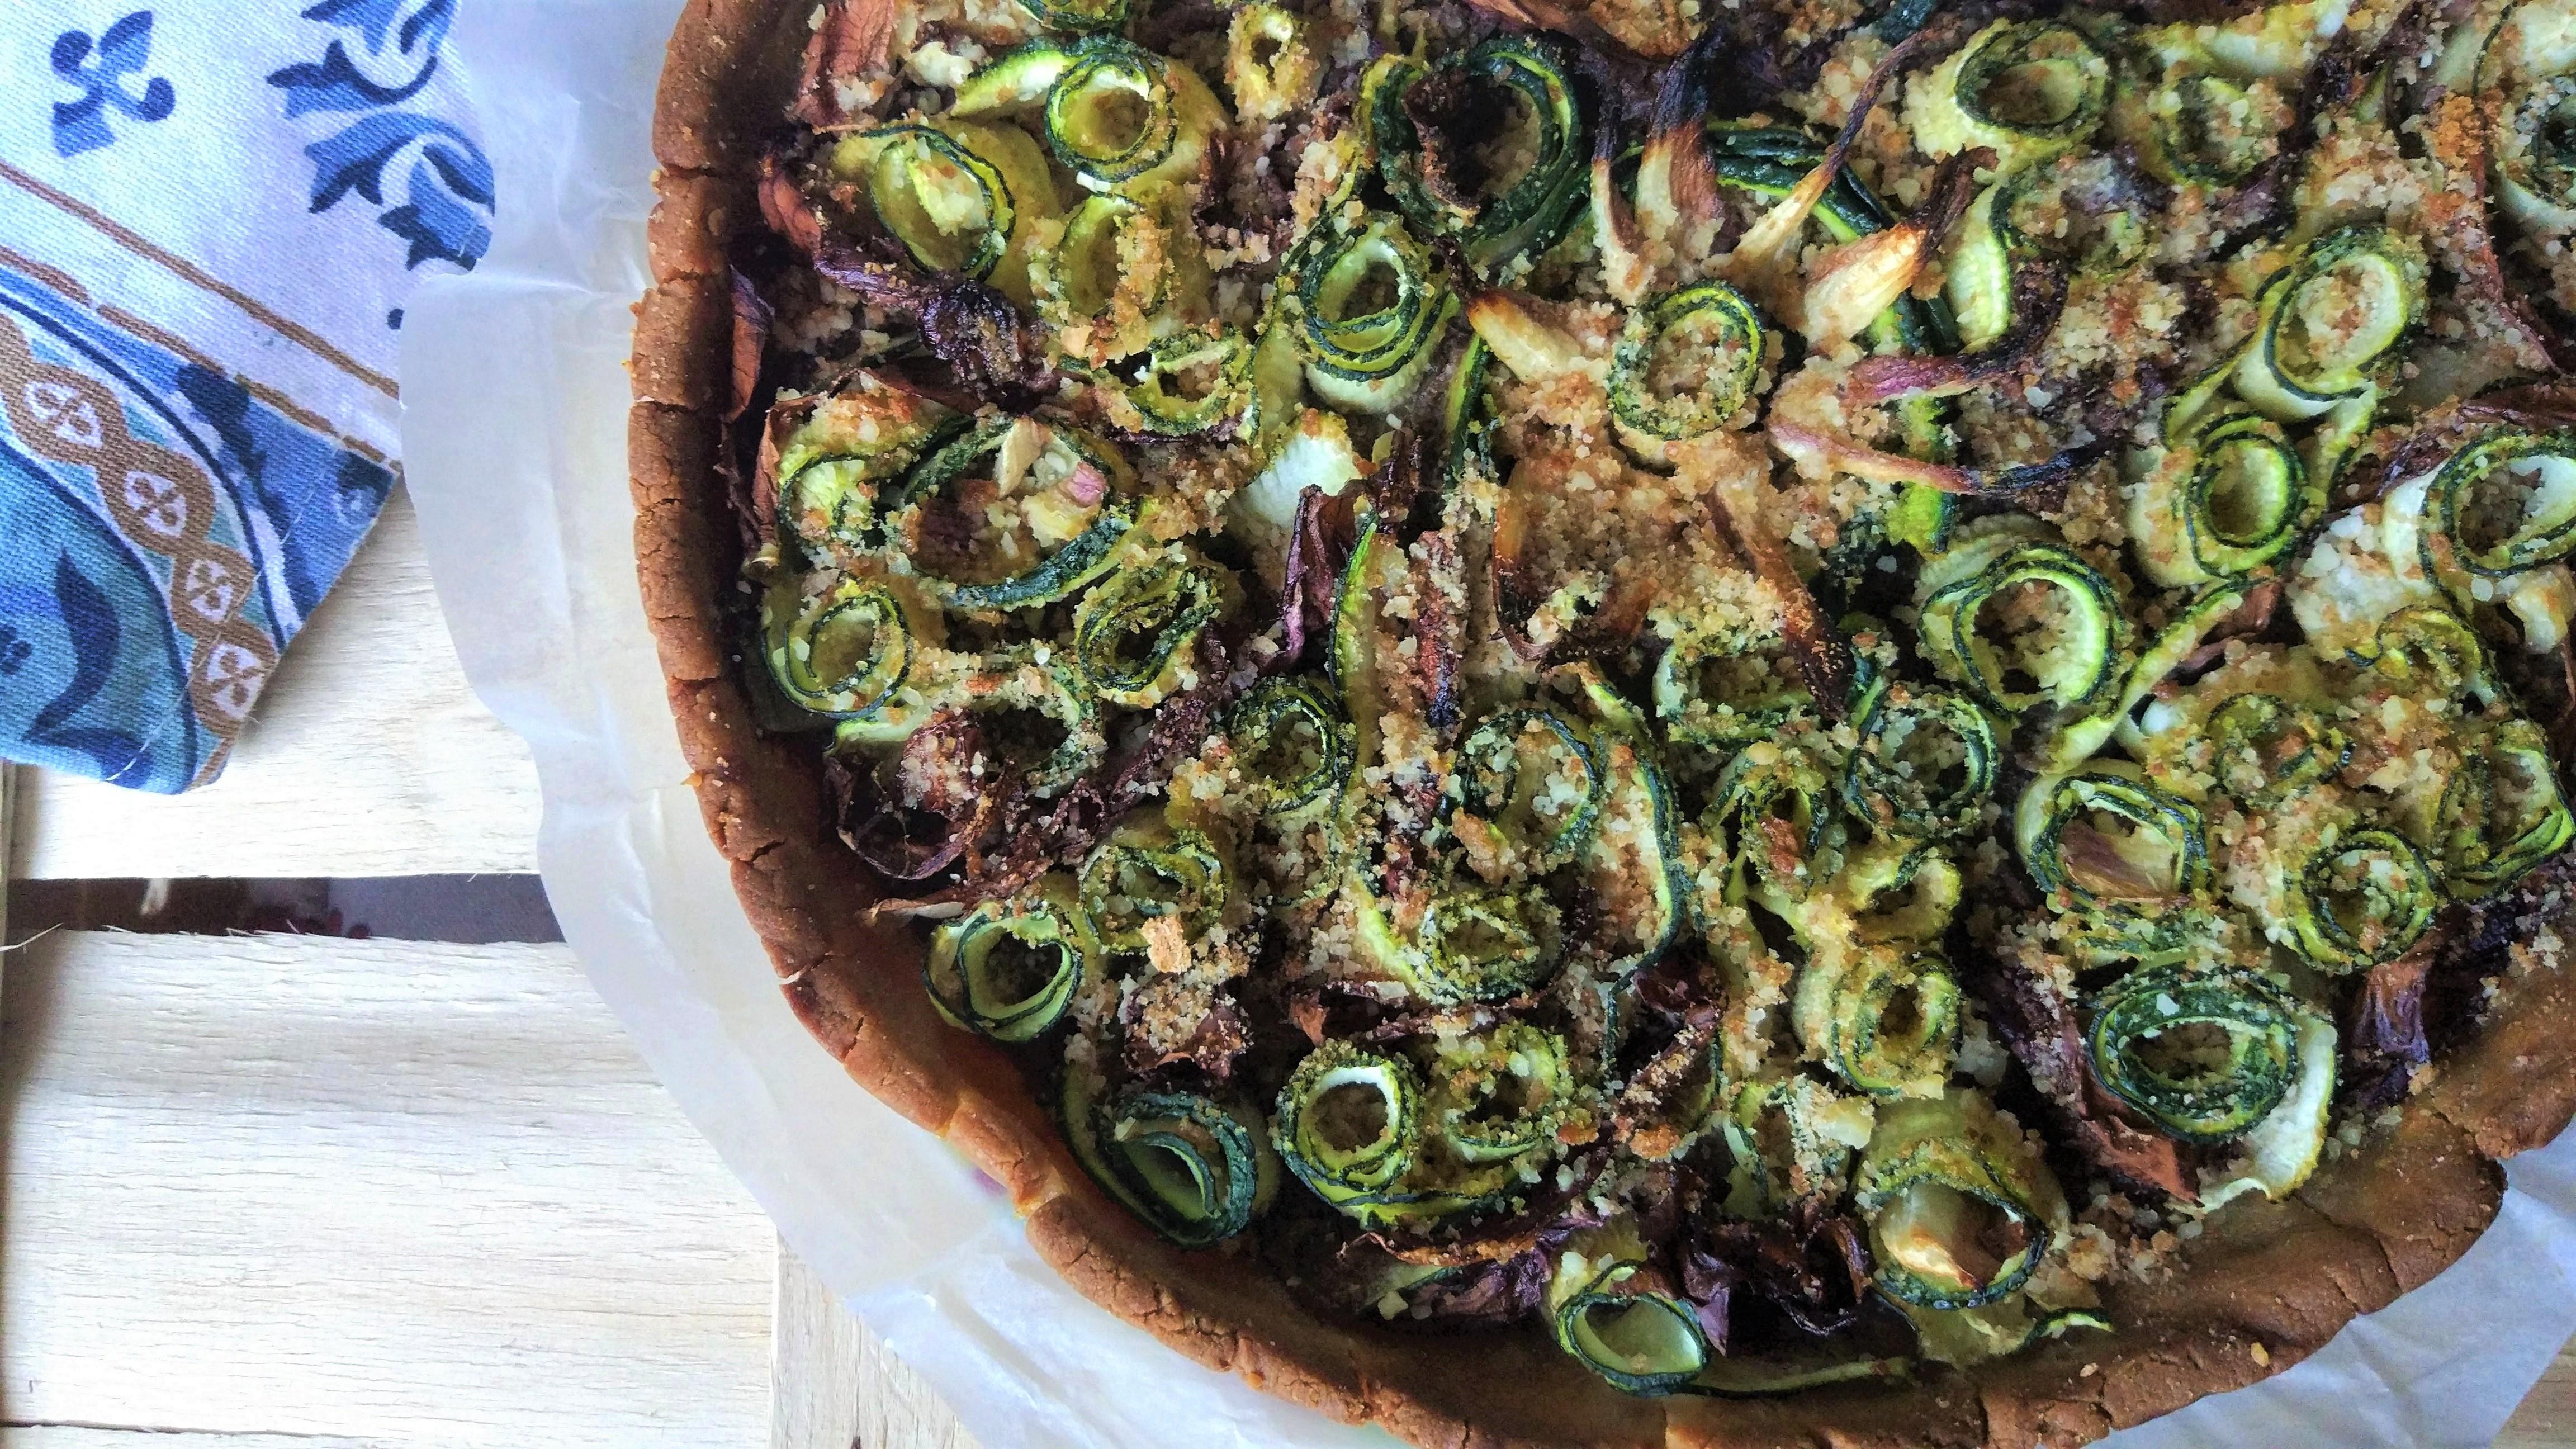 Torta salata rustica vegan senza glutine alle zucchine e radicchio